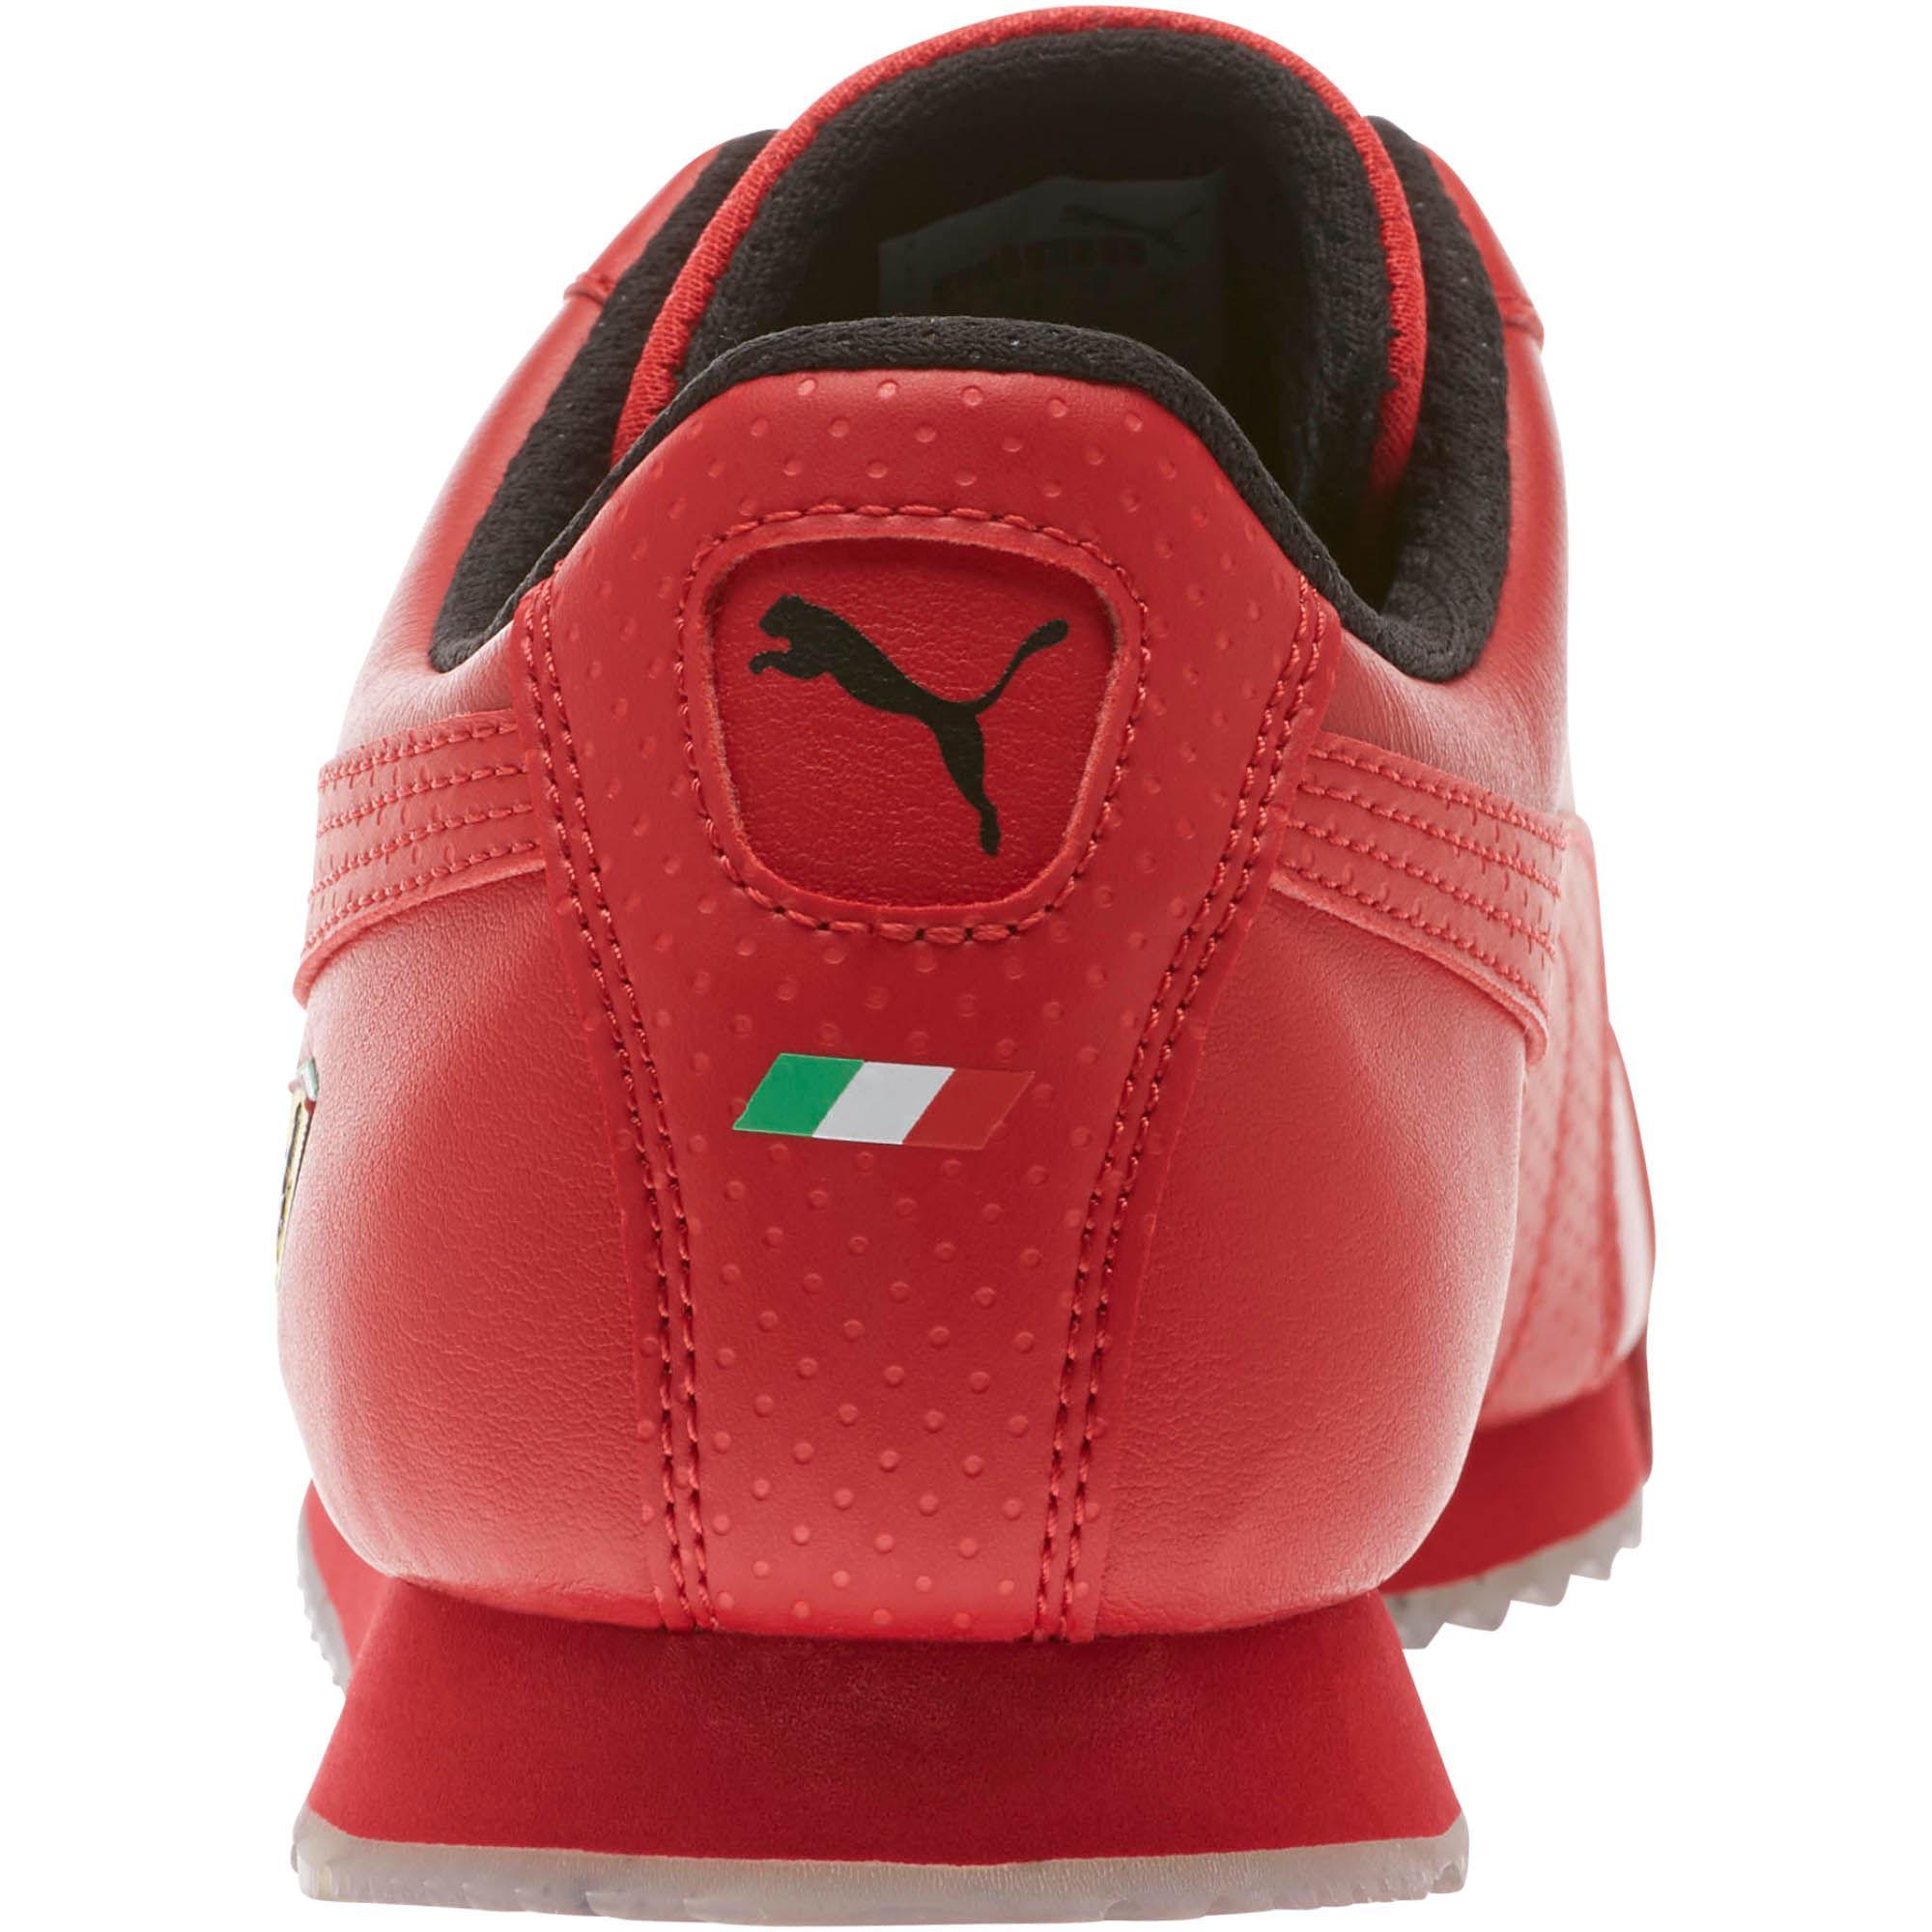 cat boot puma new ebay belt auto f low ignite itm pna ferrari men sneakers